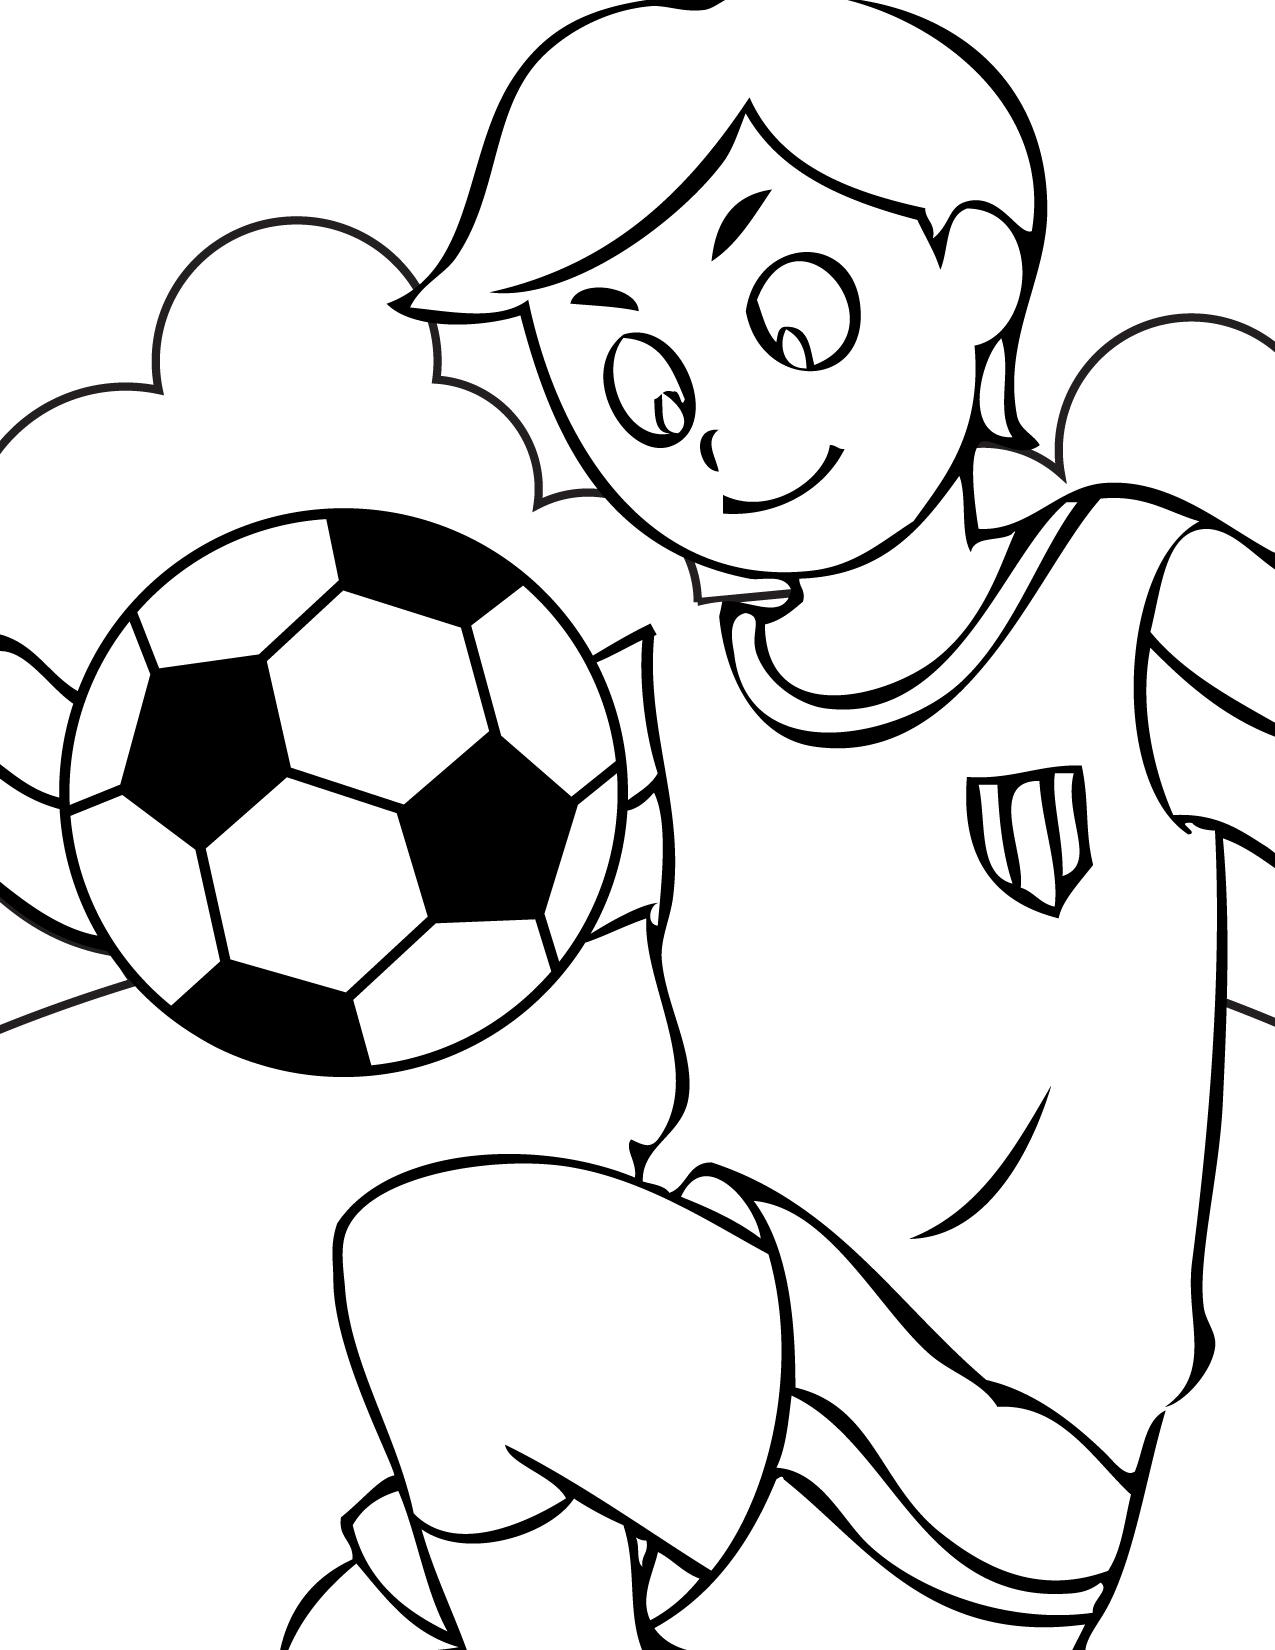 Printable Drawing Worksheets For Kids